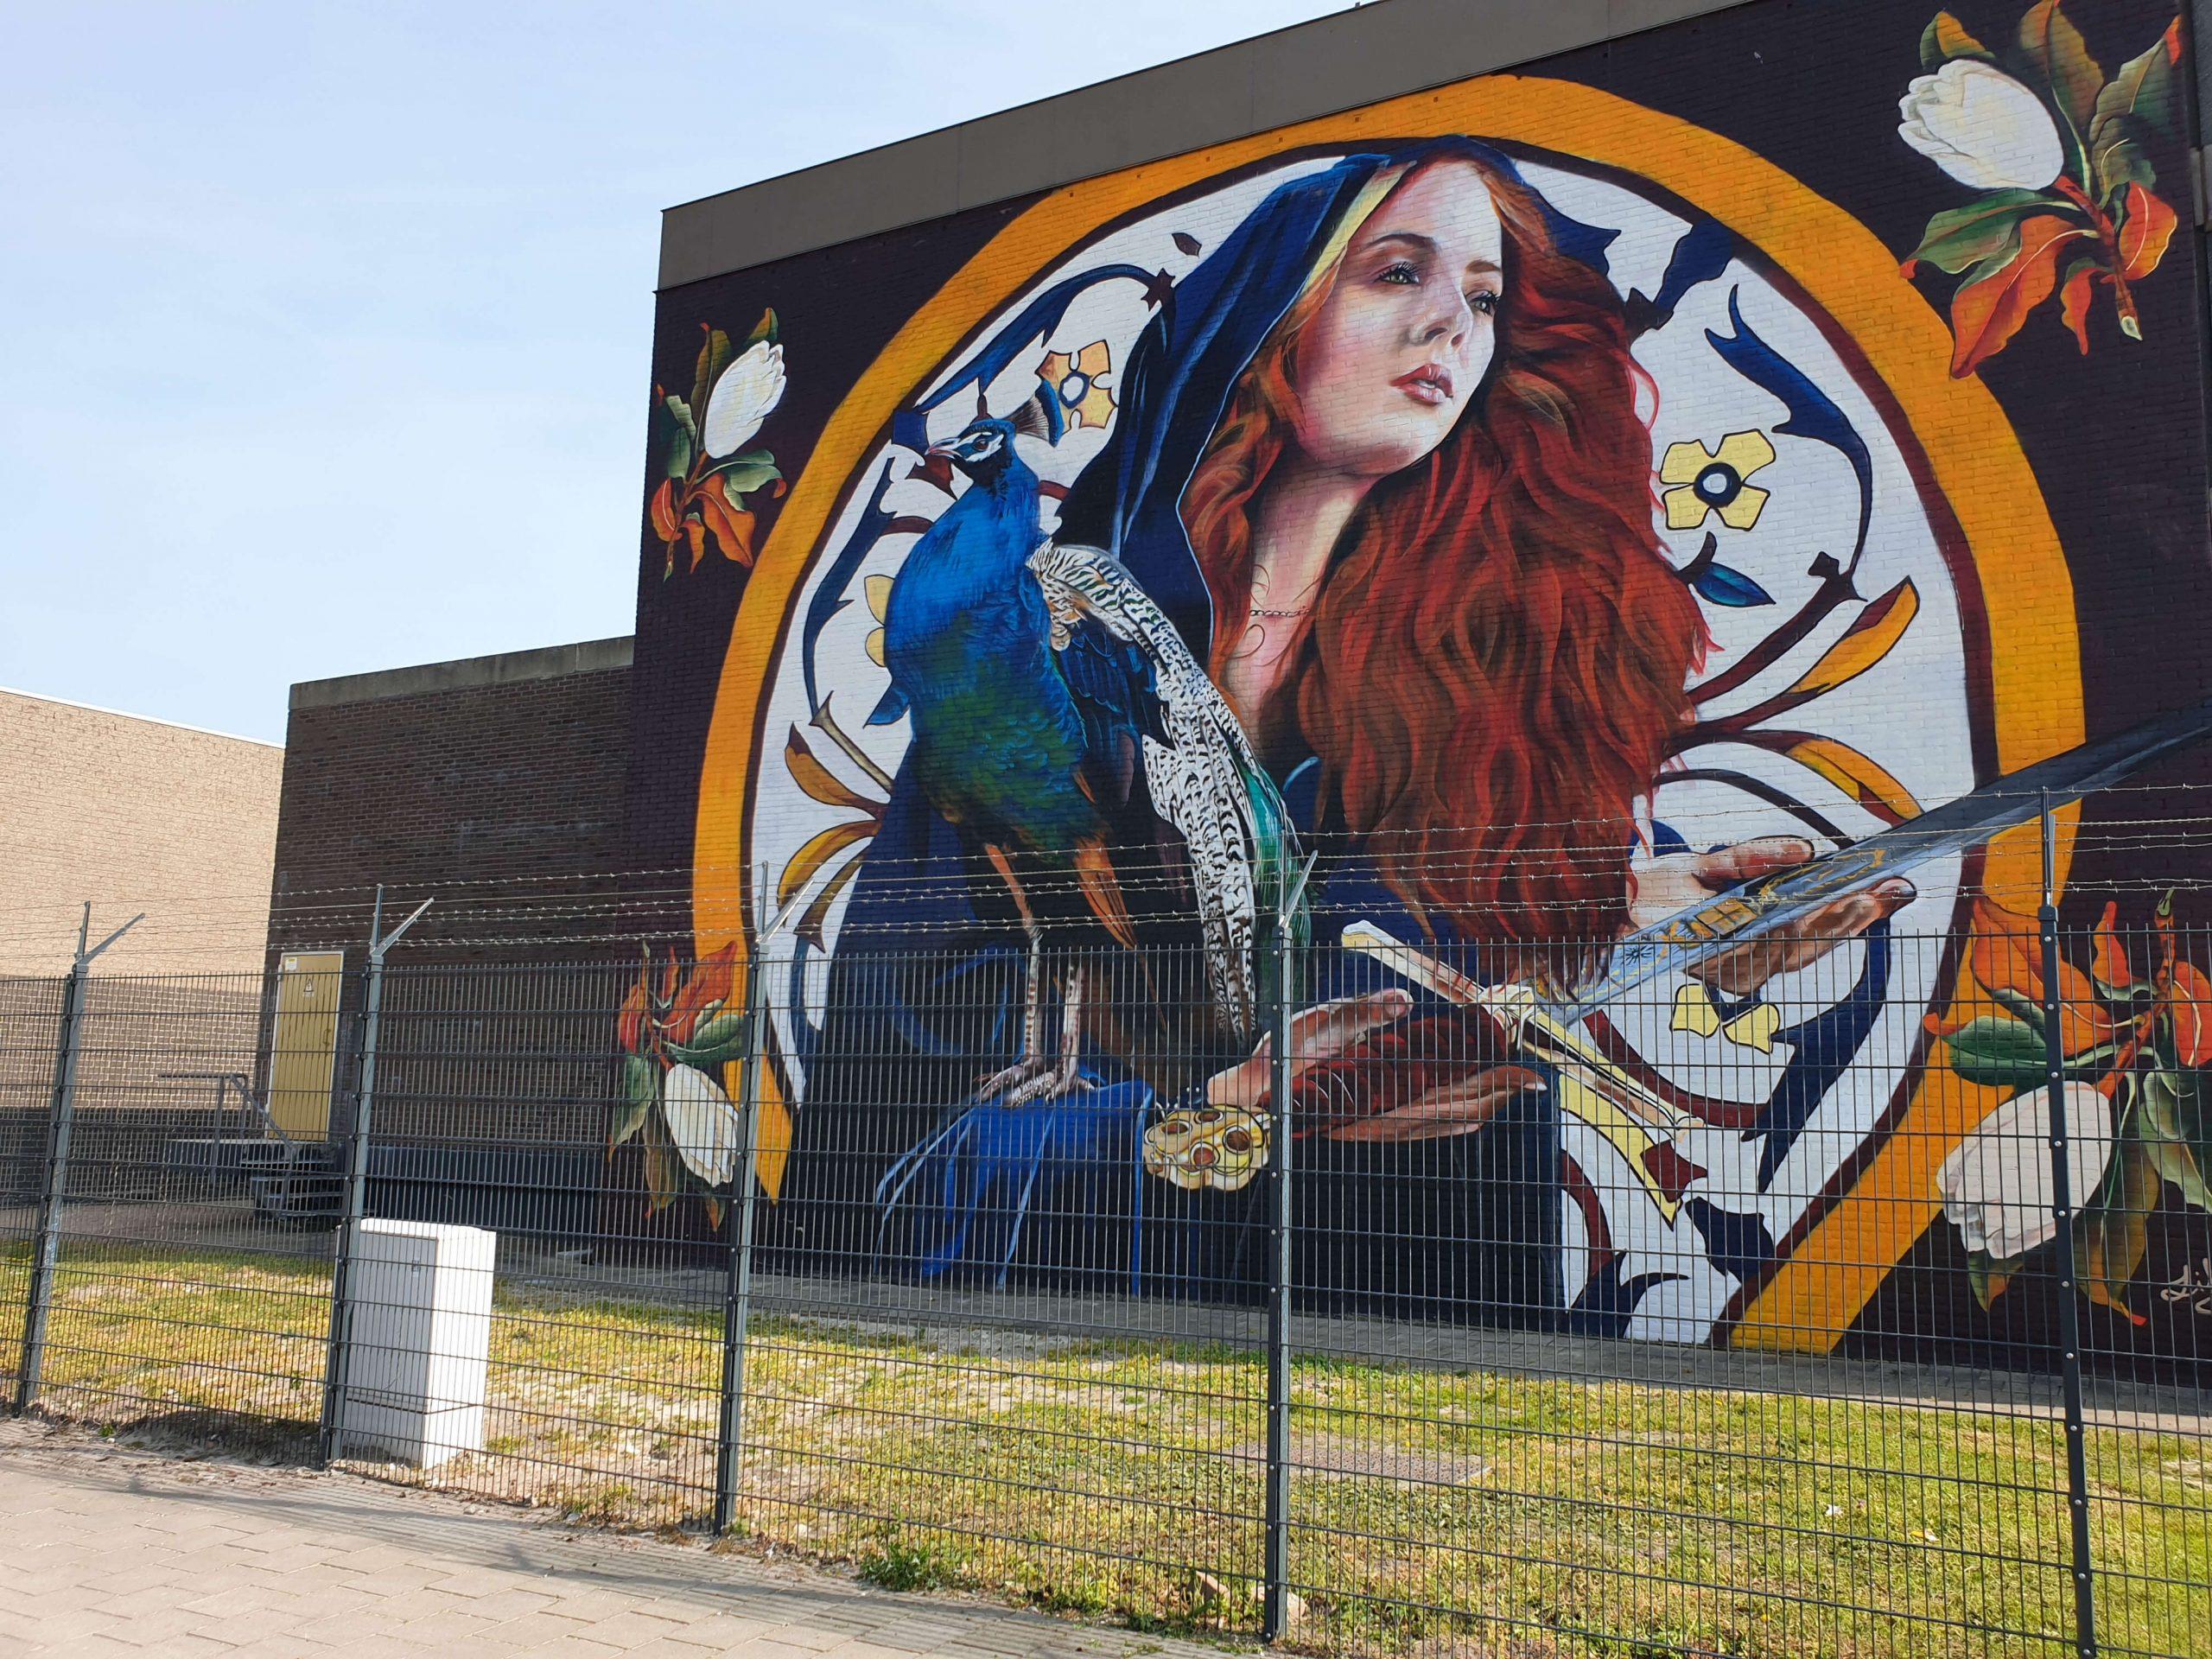 Mooiste Street Art van Den Haag